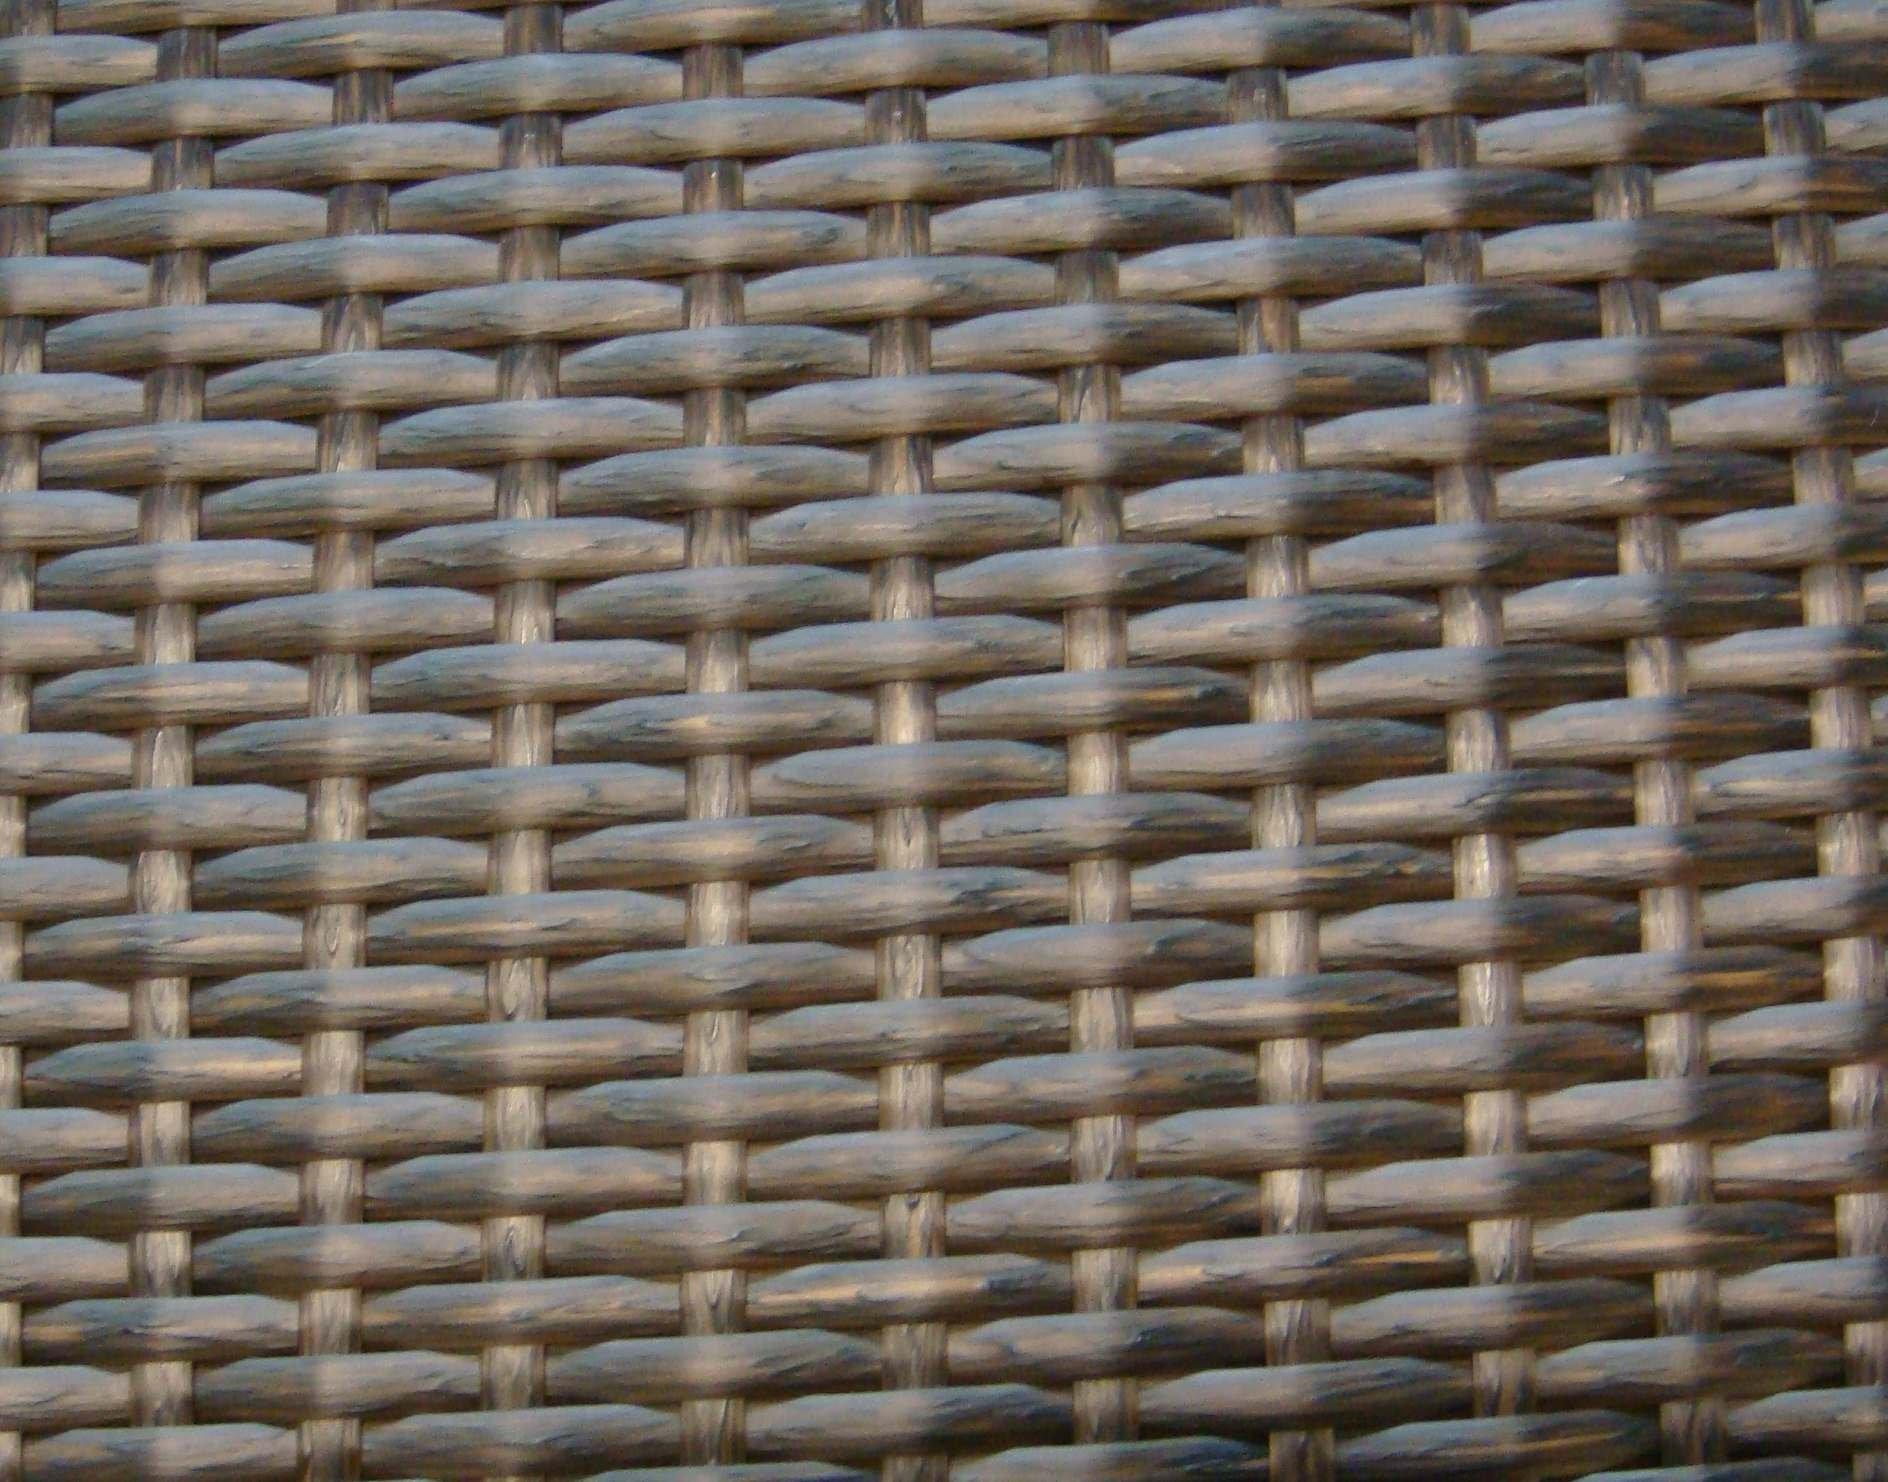 Grasekamp Pérgola Mallorca ratán. 3 x 4 m Taupe: Amazon.es: Juguetes y juegos